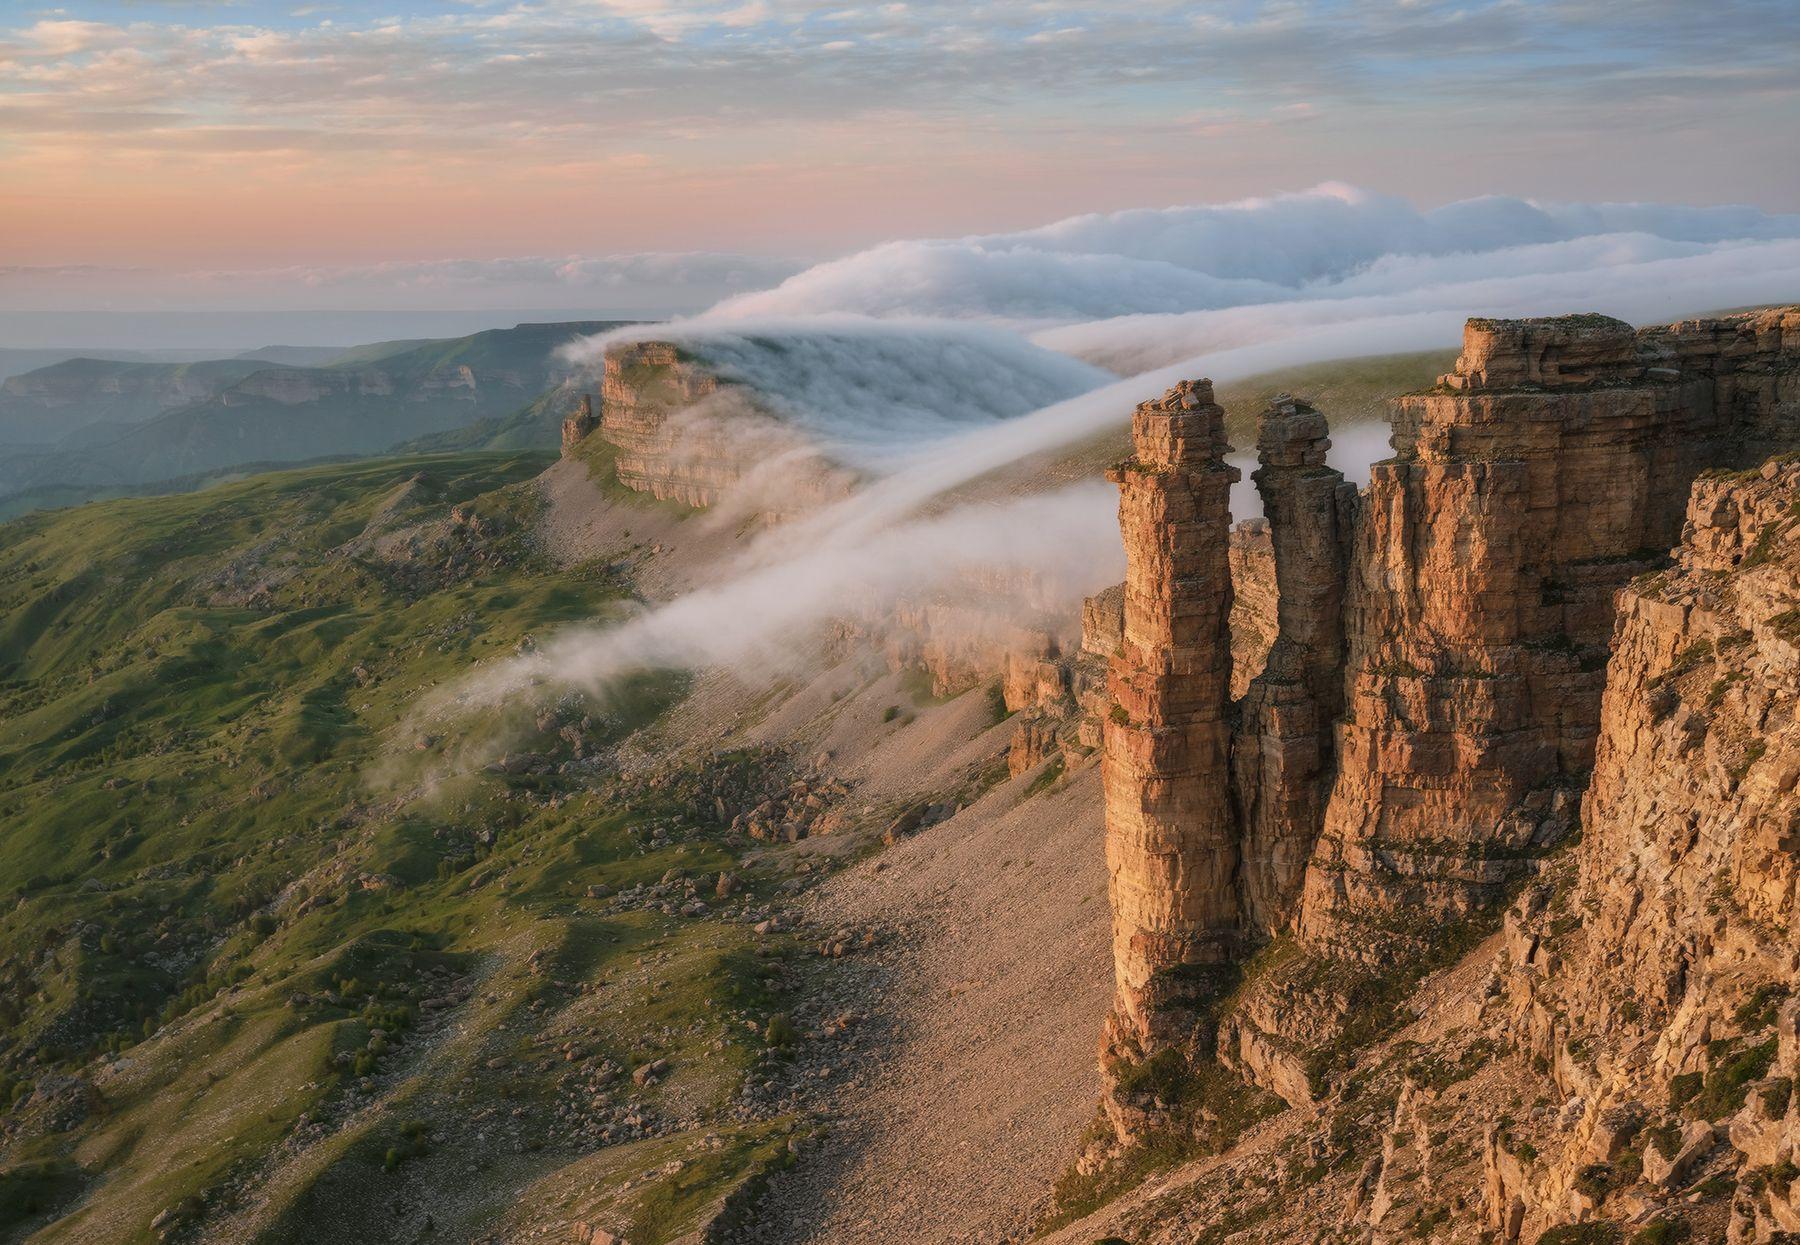 Бермамыт. Скалы Монахи. Северный кавказ карачаево-черкесия бермамыт монахи закат июнь